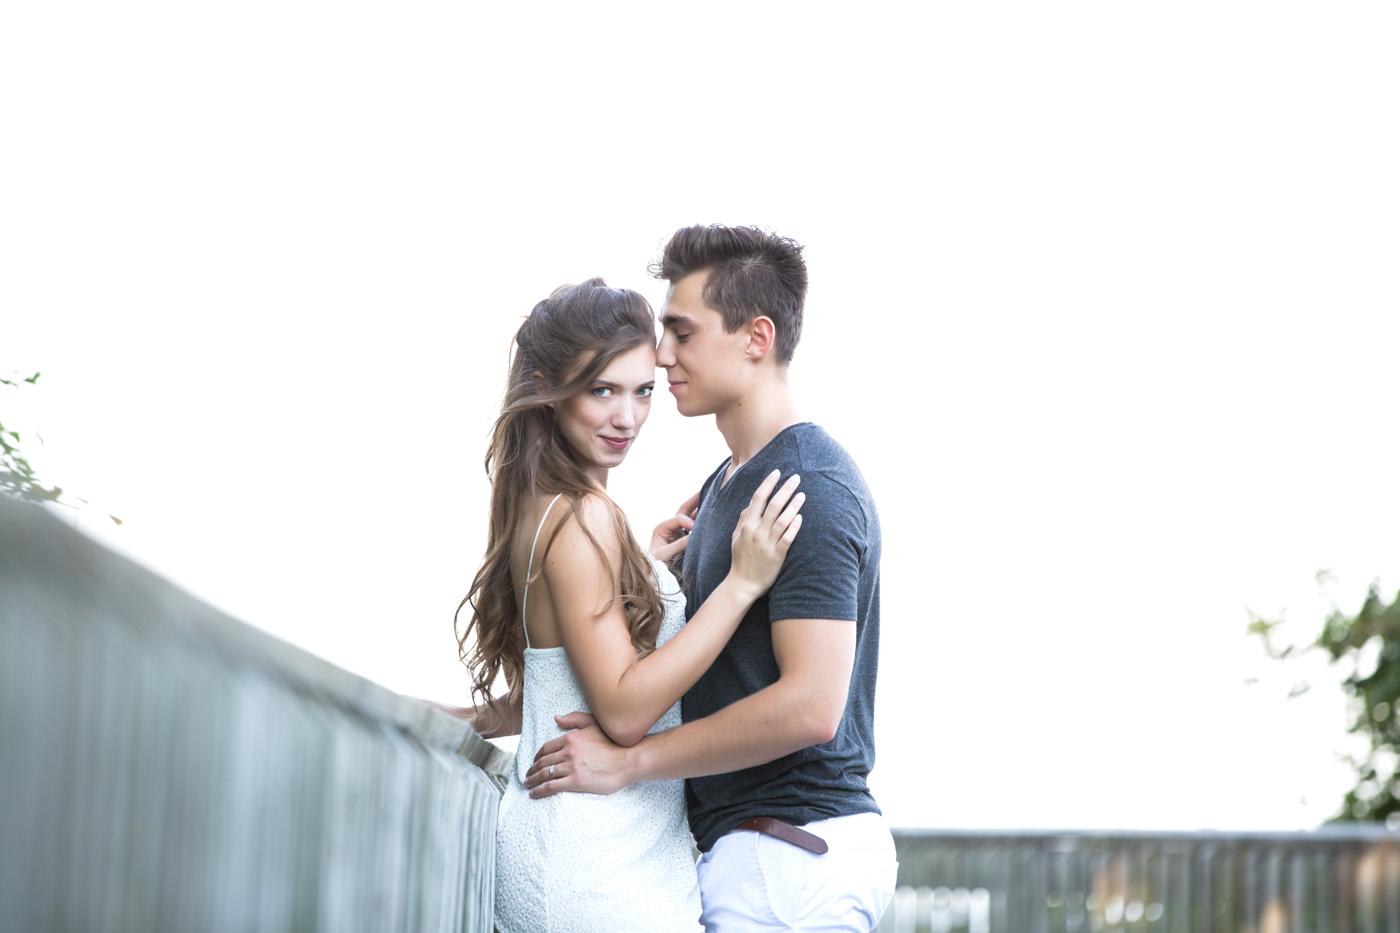 summer-beach-engagement-shoot-ksenia-pro-photography-3